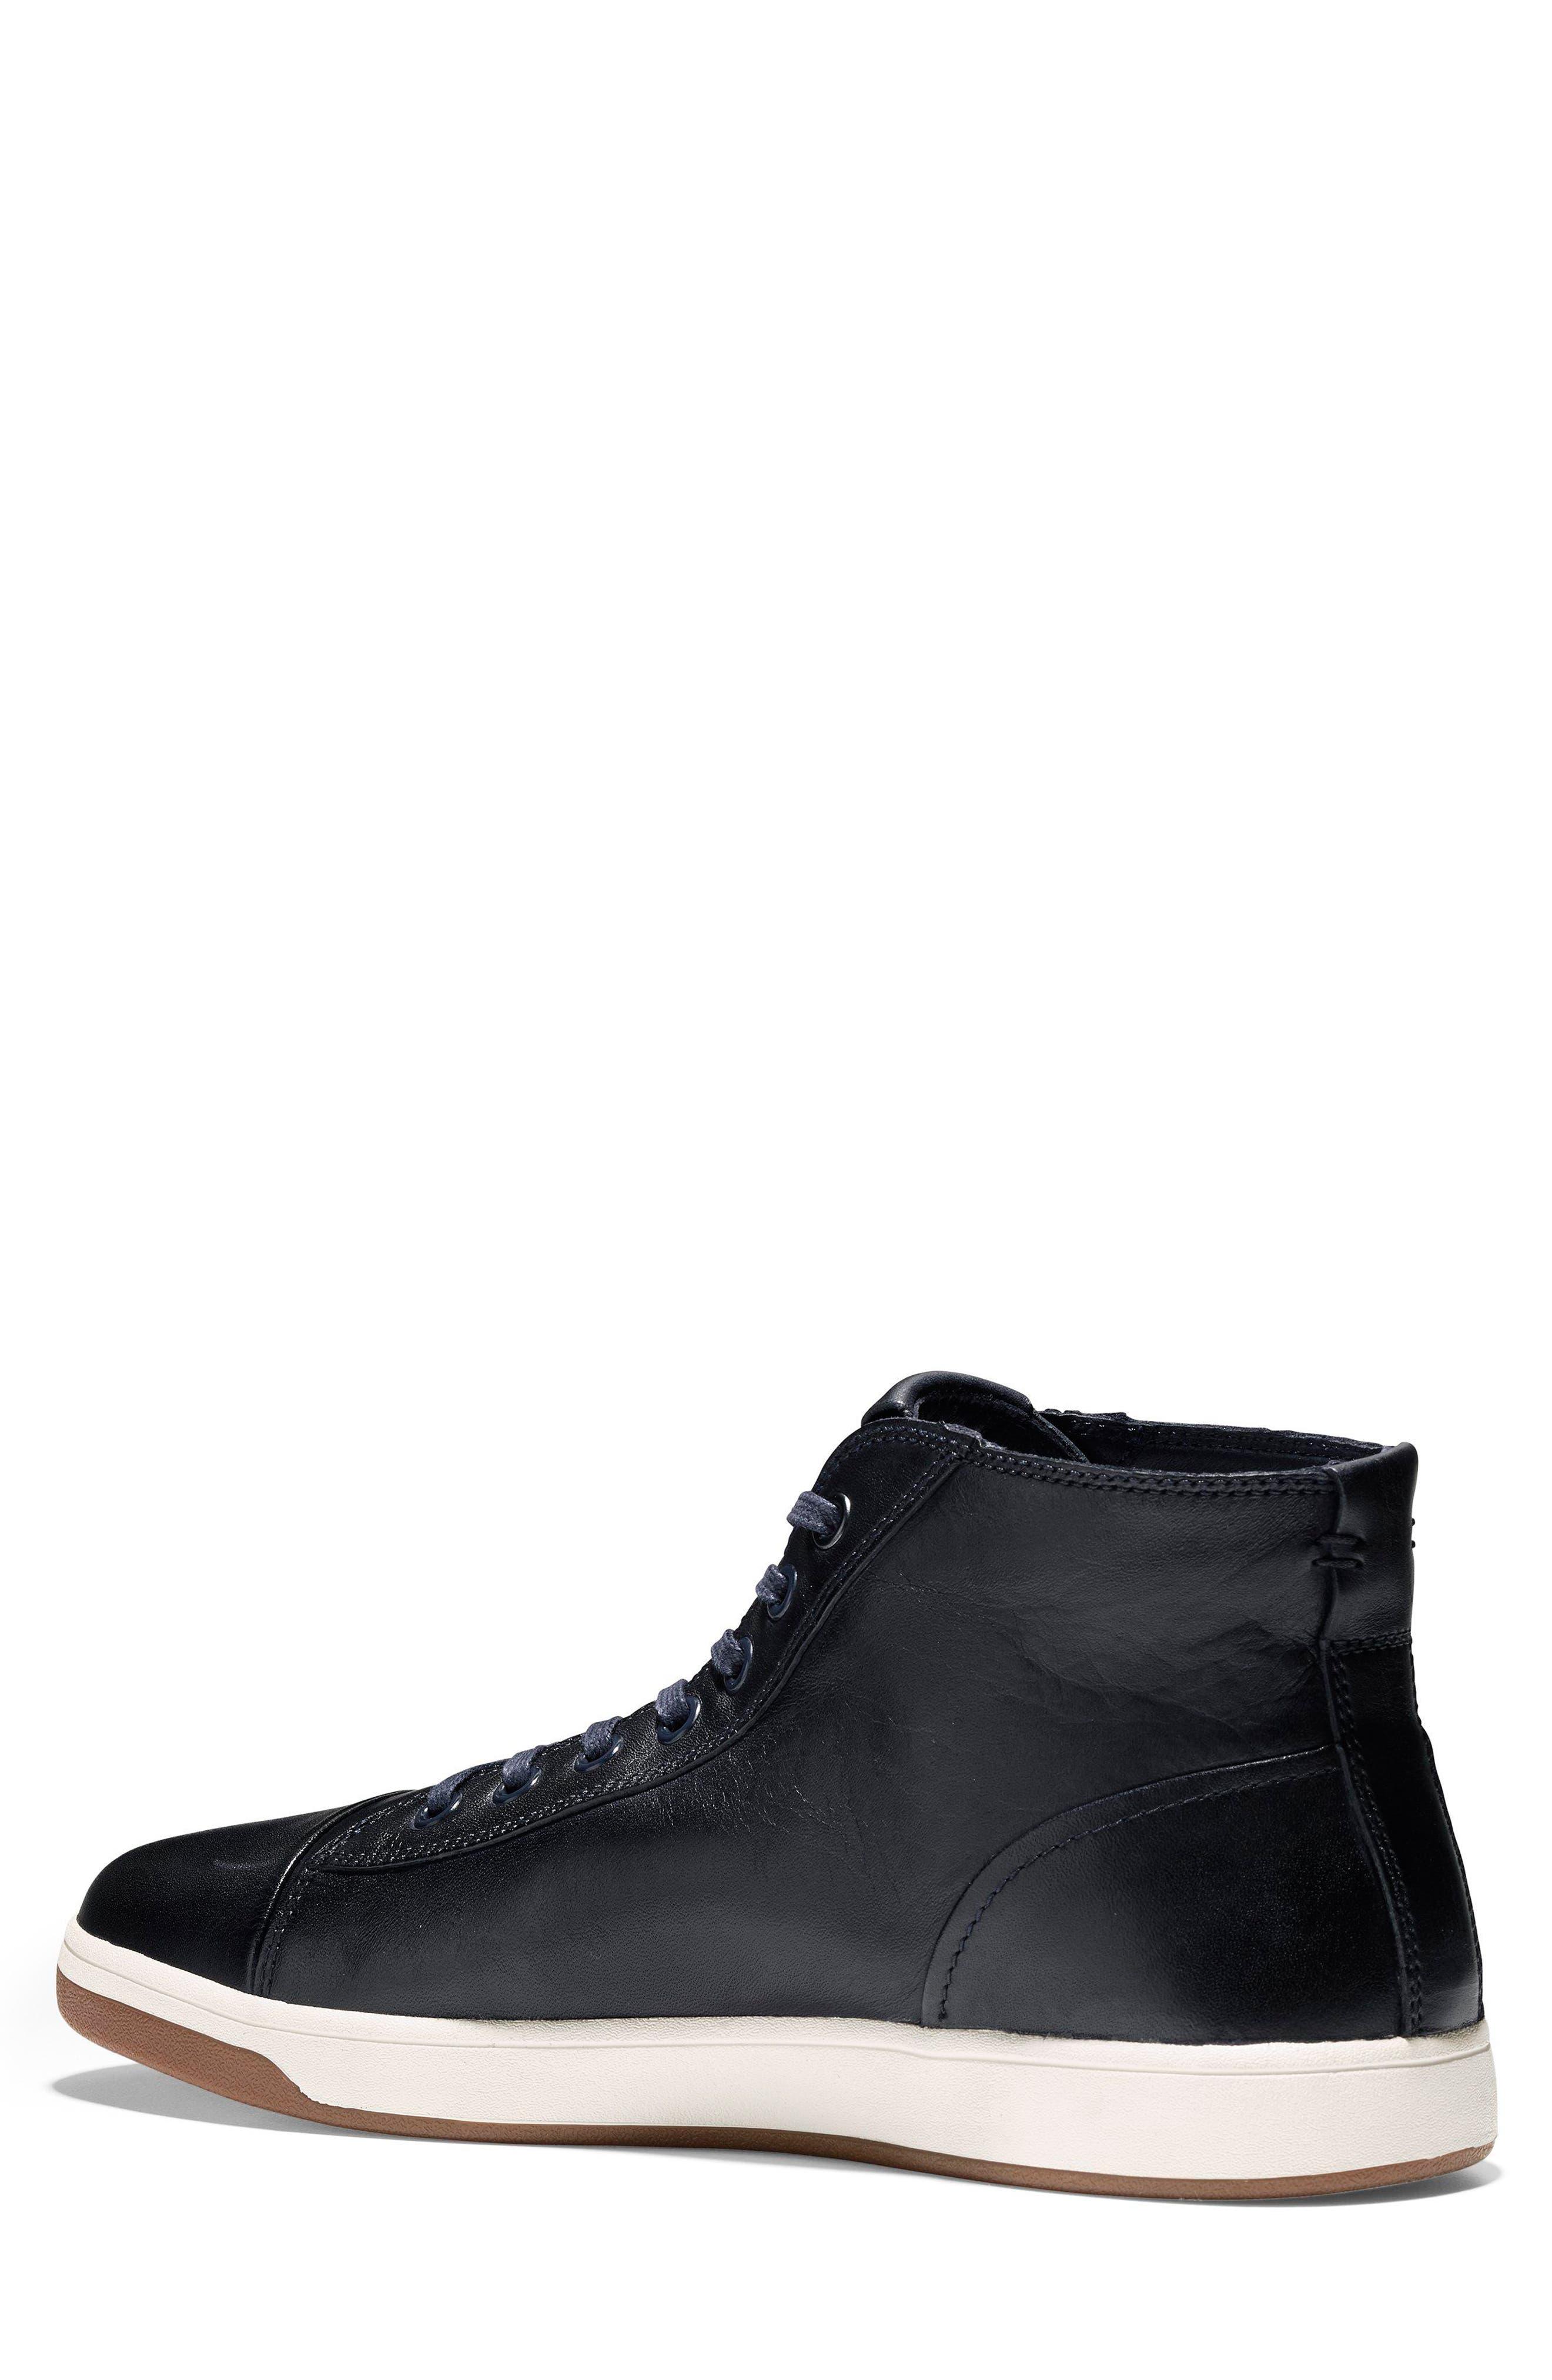 GrandPro High Top Sneaker,                             Alternate thumbnail 4, color,